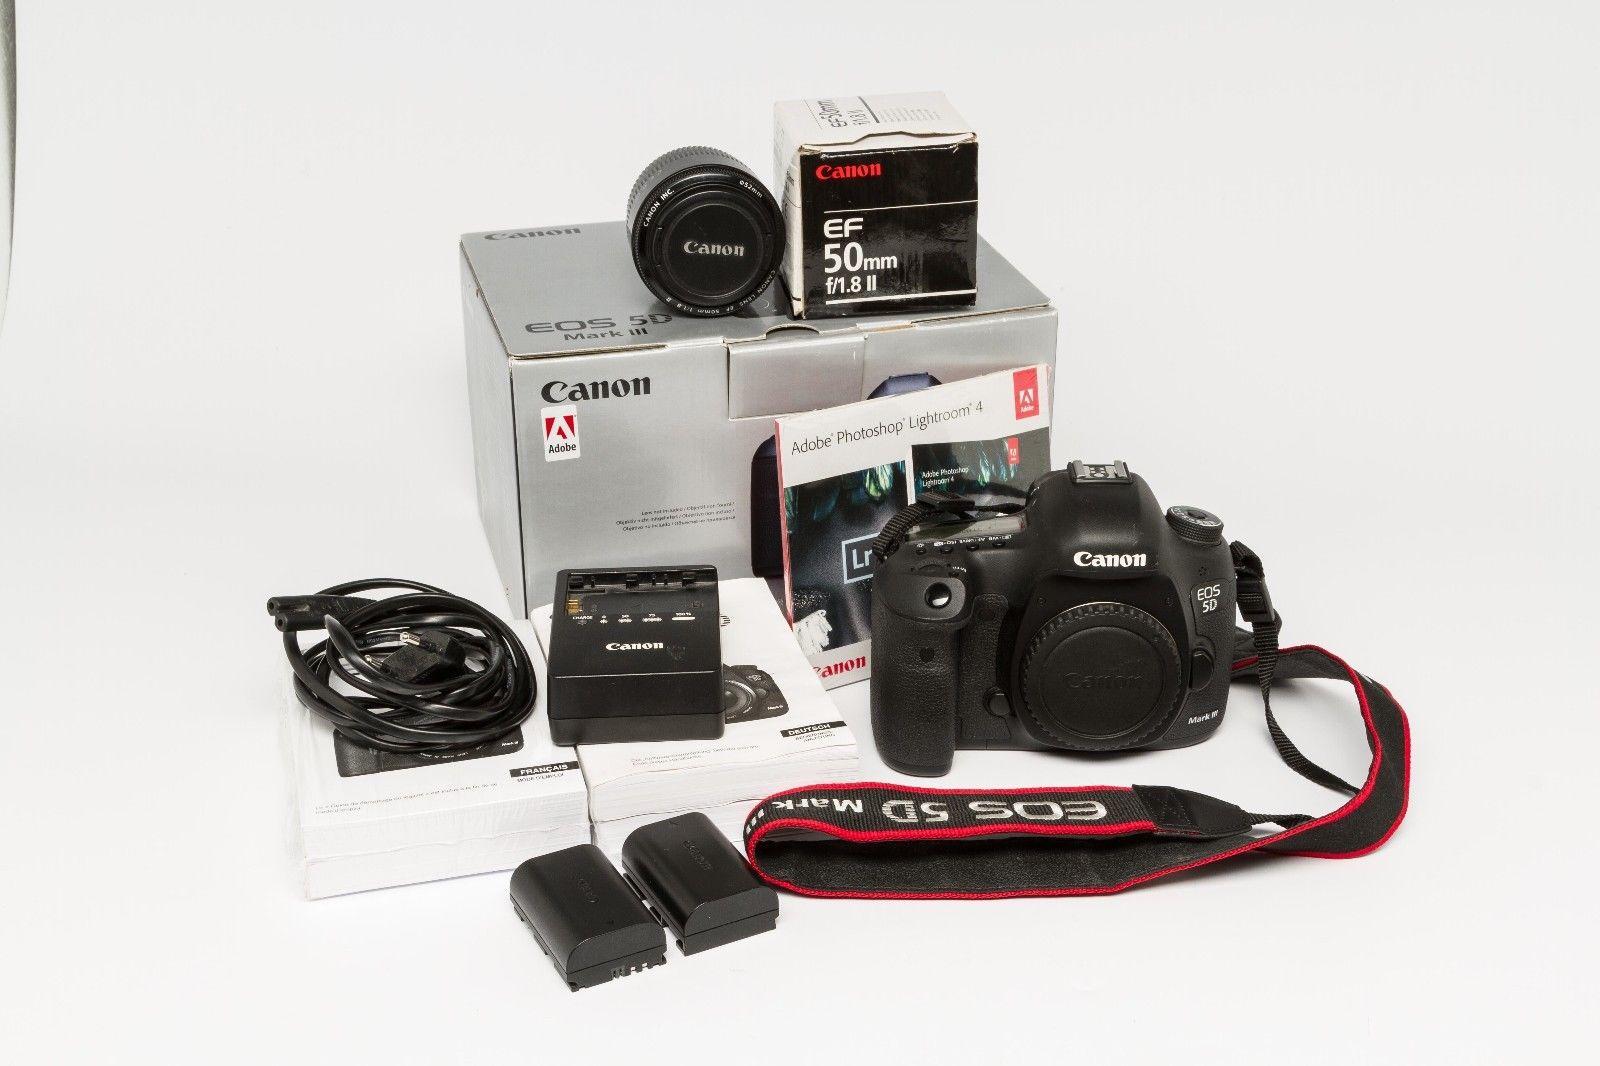 Canon EOS 5D Mark III 22.3 MP DSLR-Digitalkamera - wenig Auslösungen